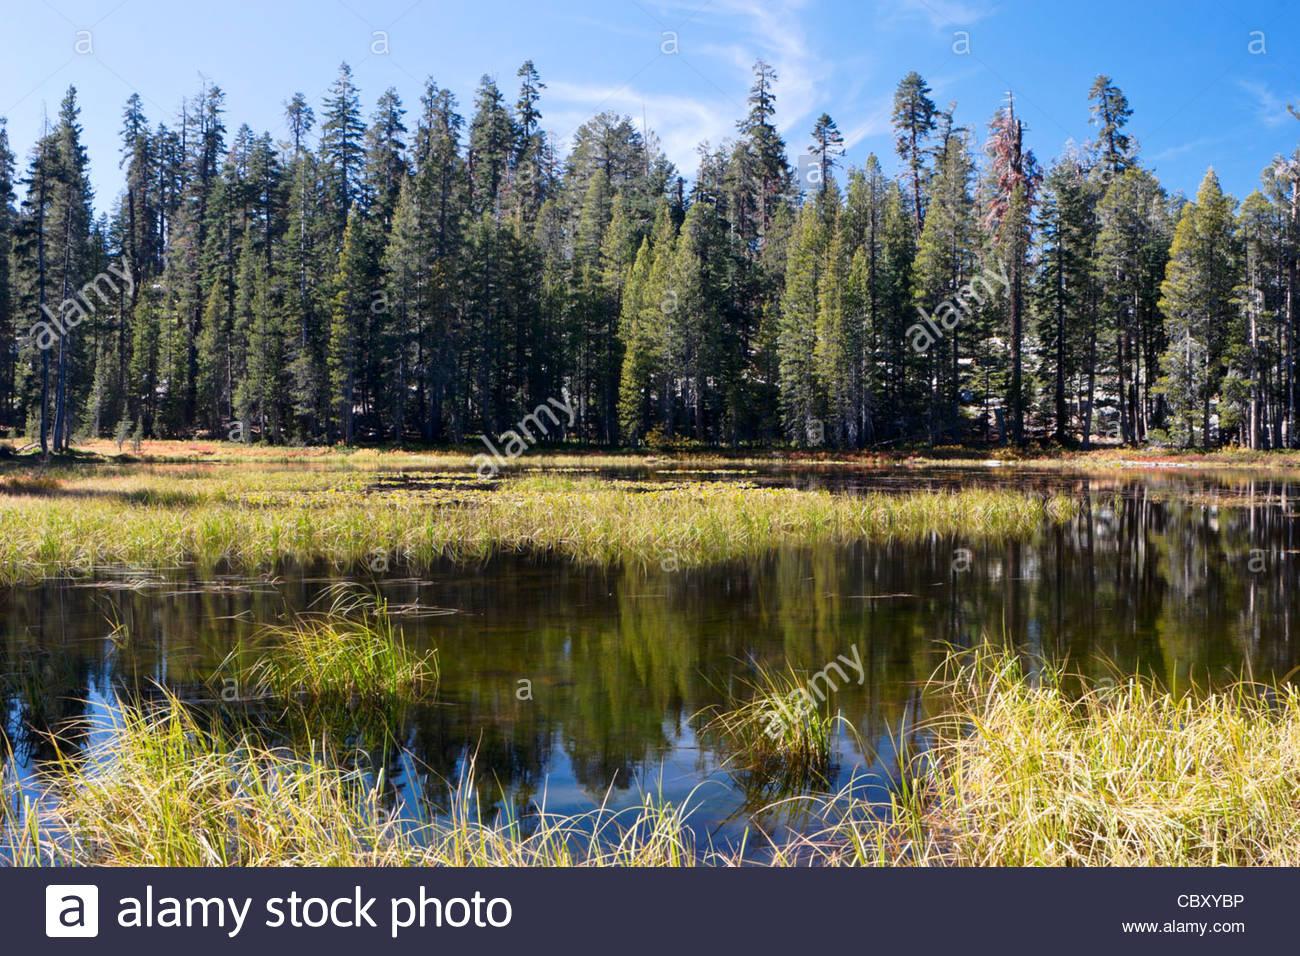 Siesta Lake - Small Alpine Lake on Tioga Pass, Yosemite National Park, California - Stock Image